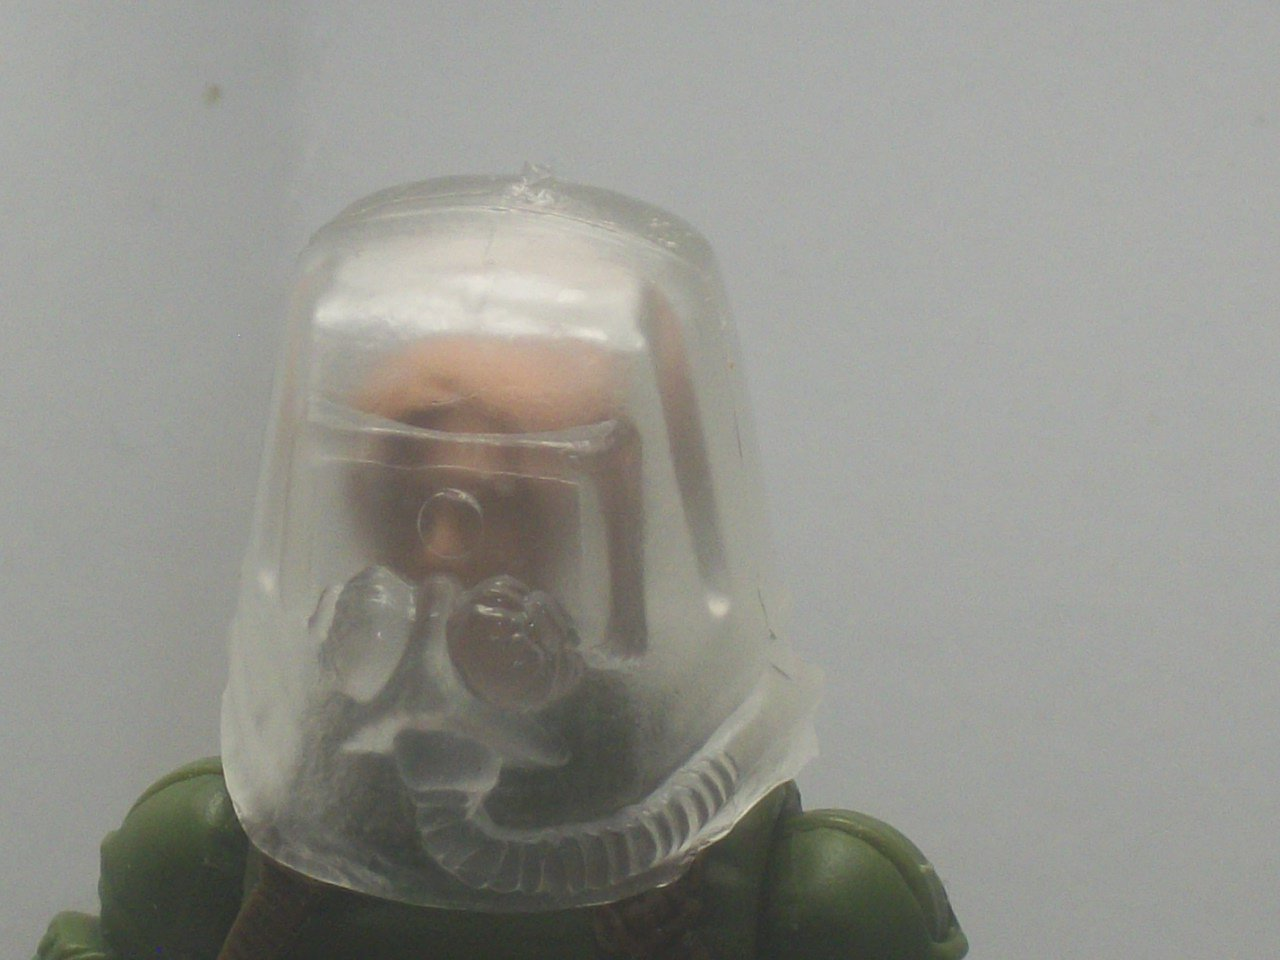 Clear Hazmat helmet